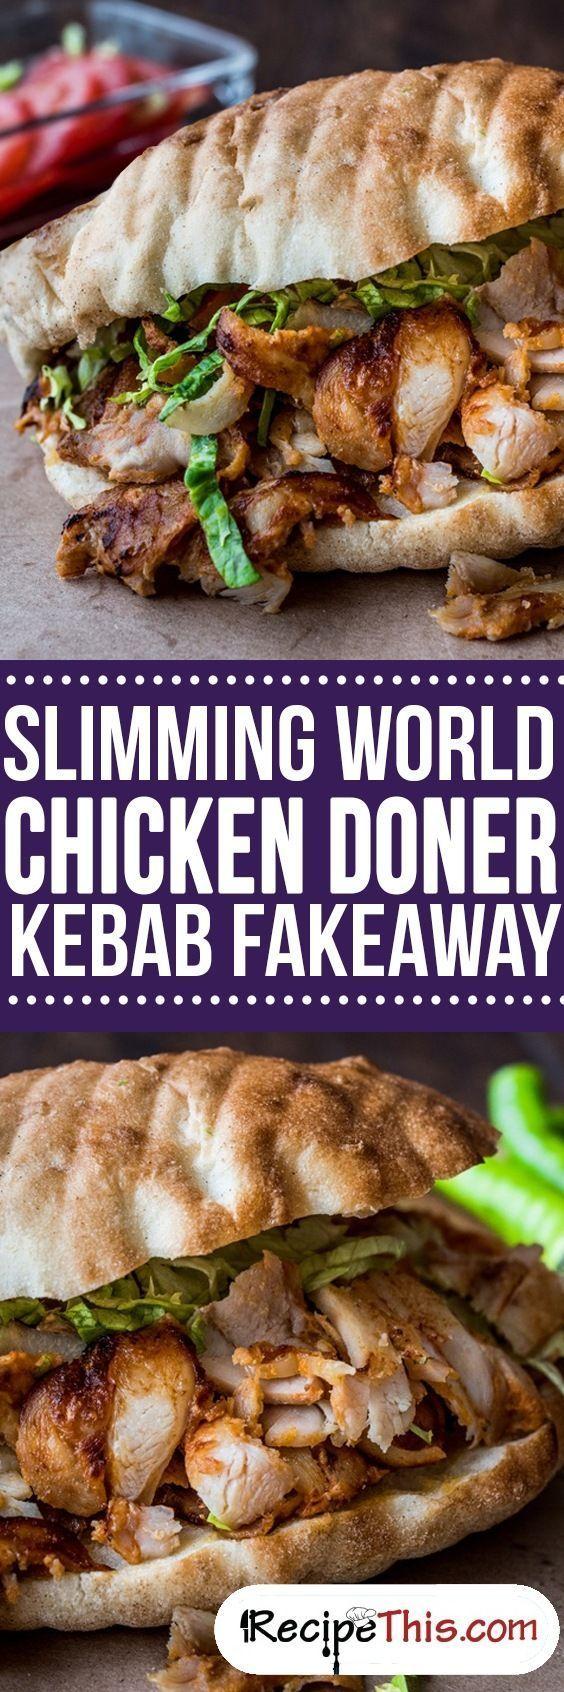 #SlimmingWorld | Slimming World Chicken Doner Kebab Fakeaway